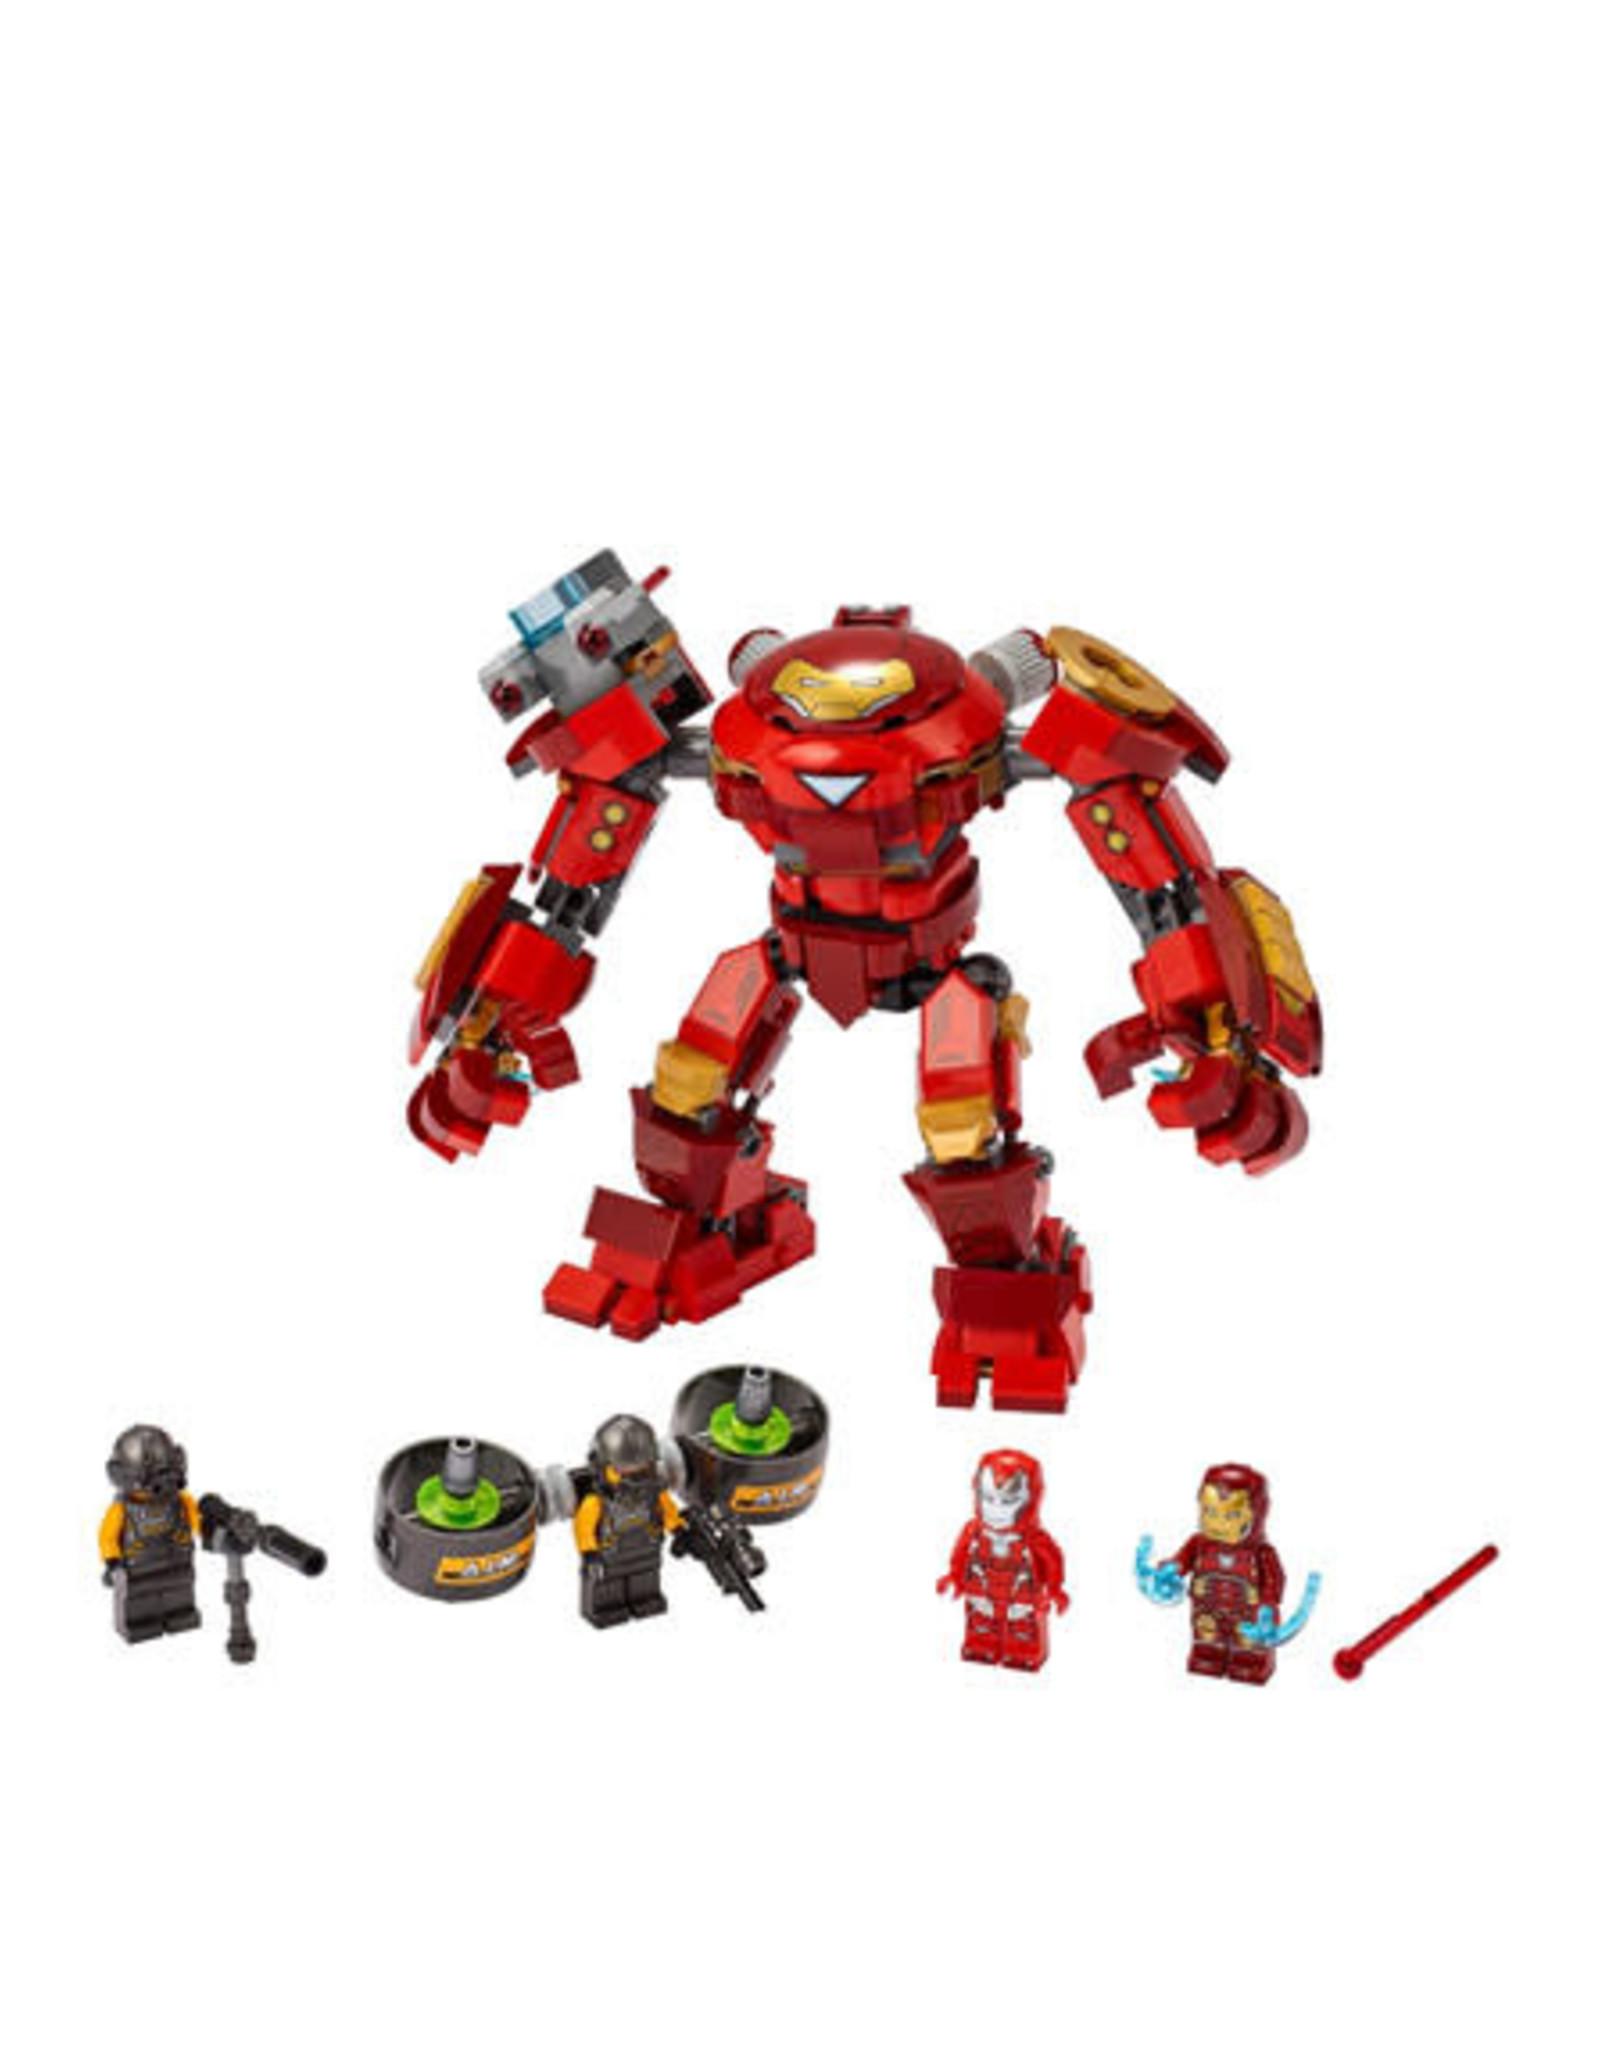 LEGO LEGO 76164 Iron Man Hulkbuster versus A.I.M. Agent SUPER HEROES NIEUW